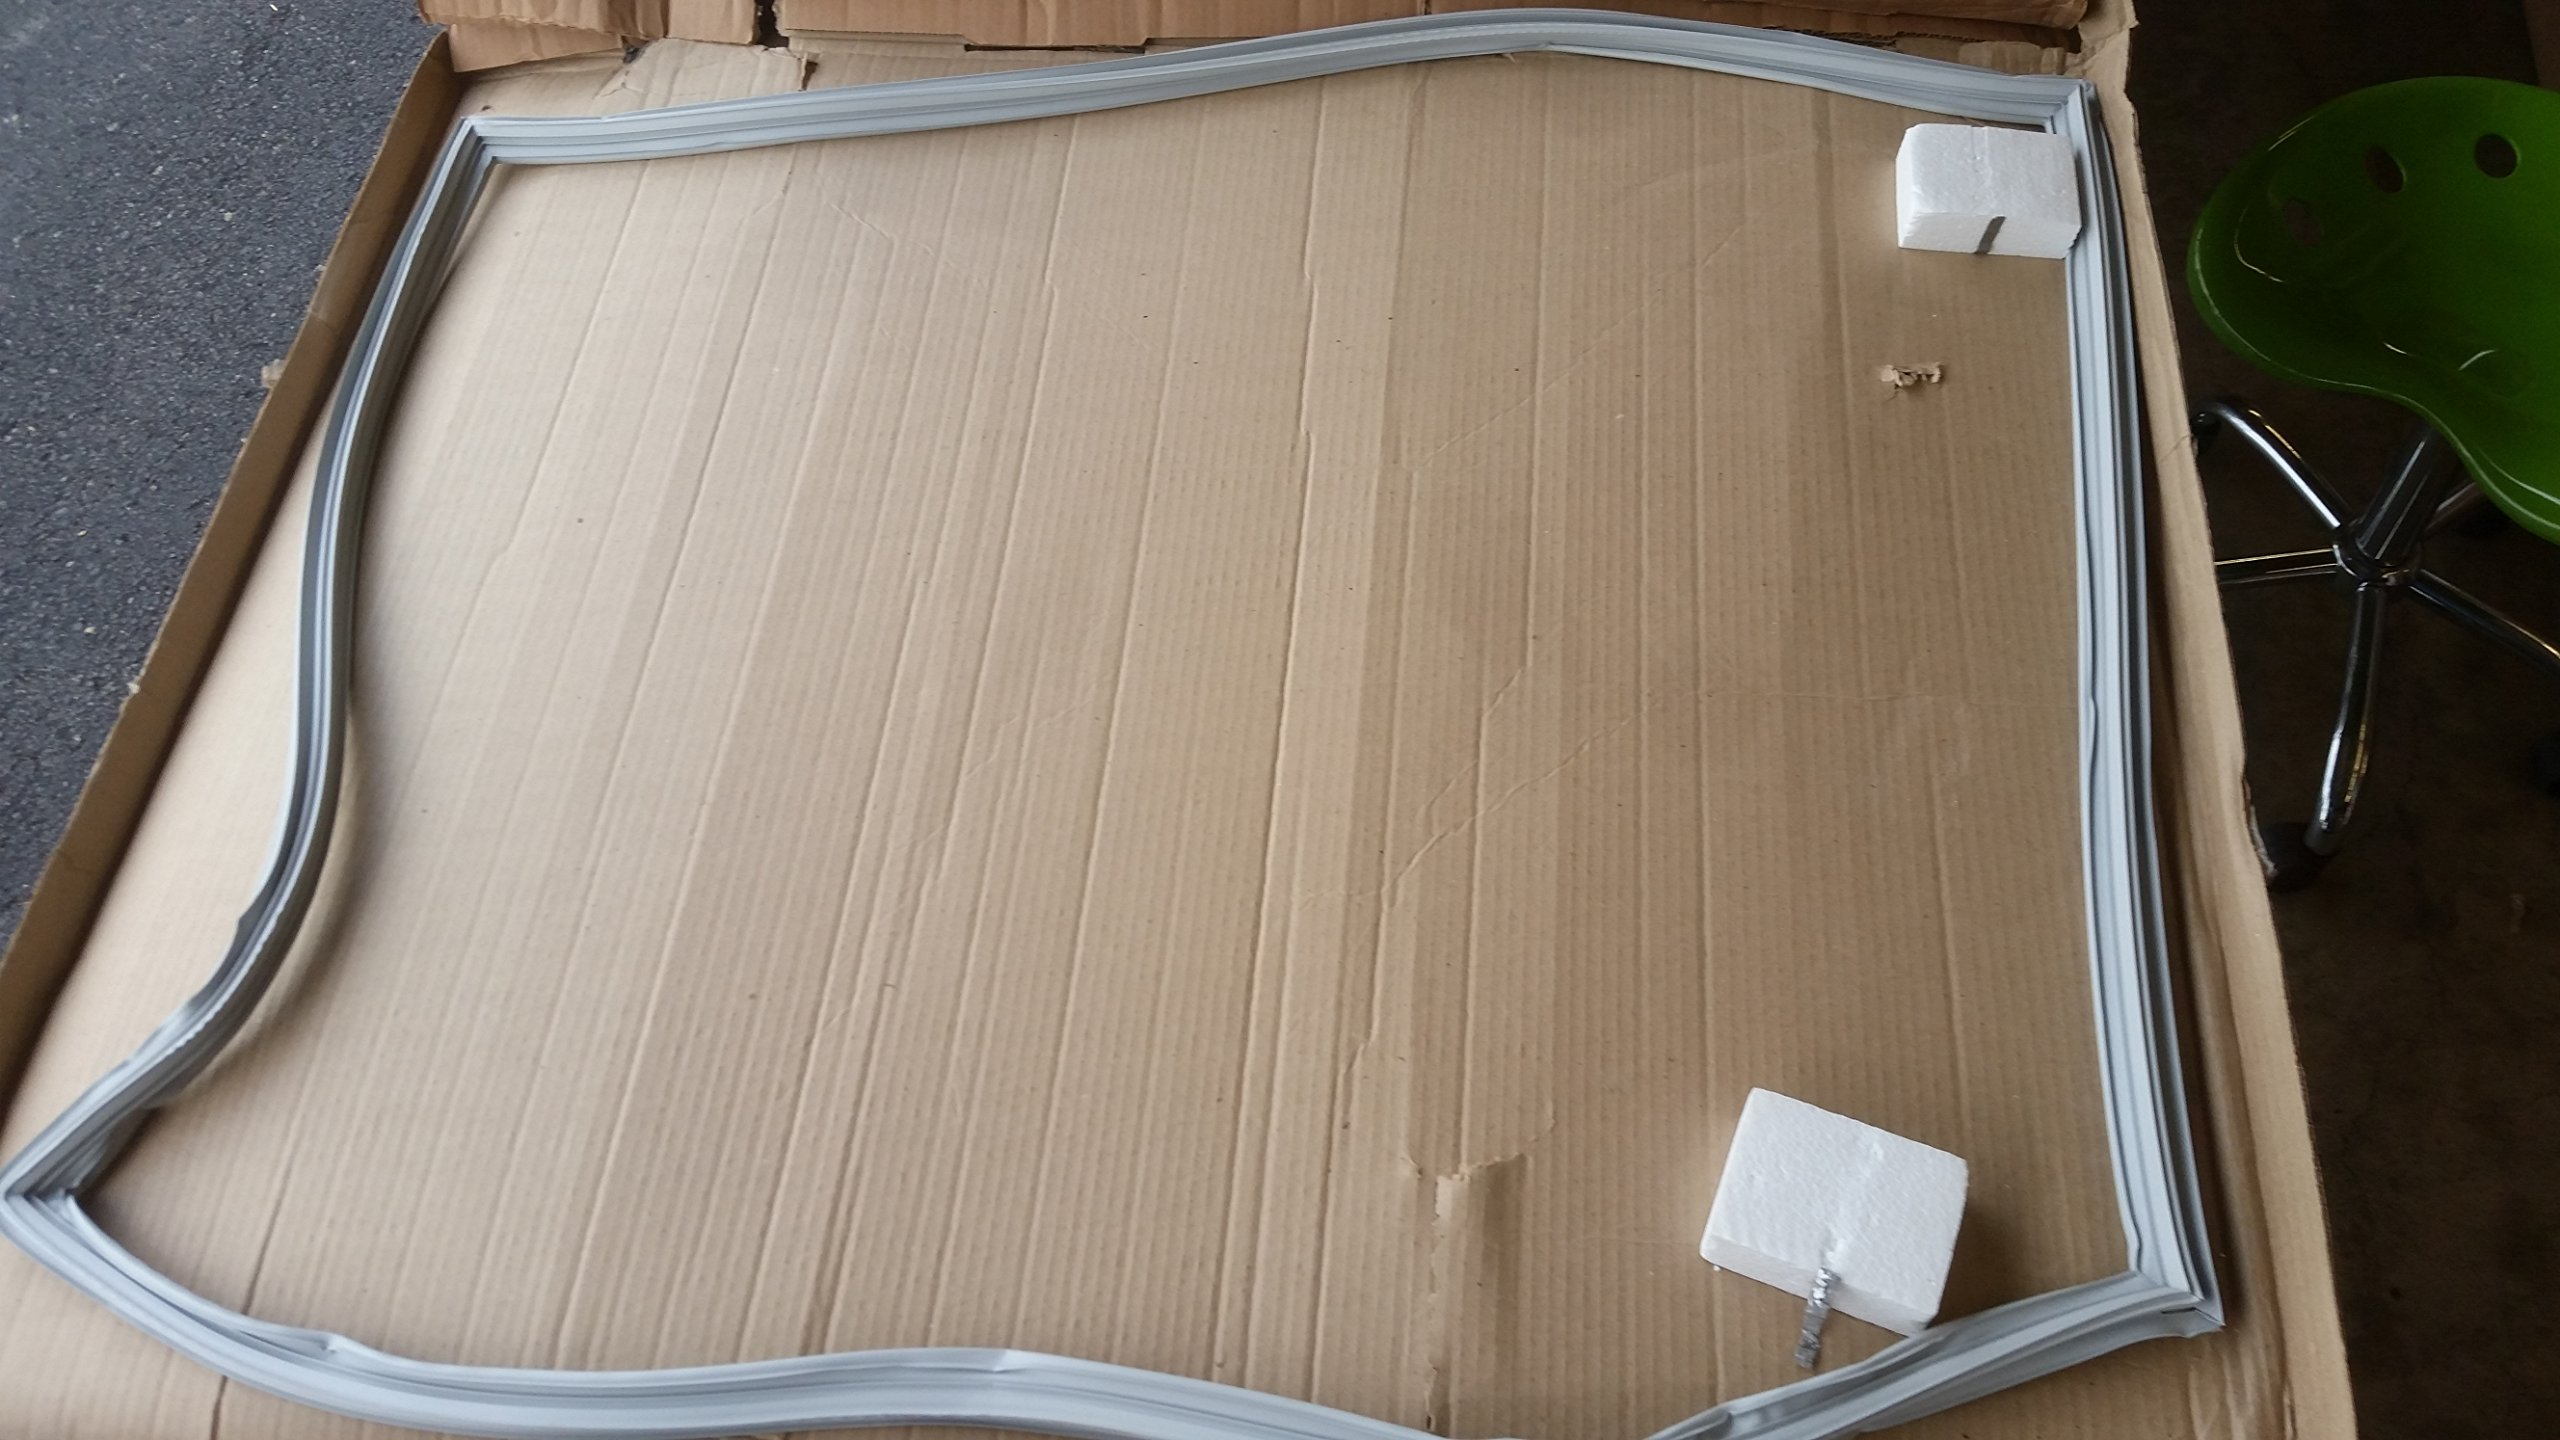 LG ADX52752667 Gasket, White